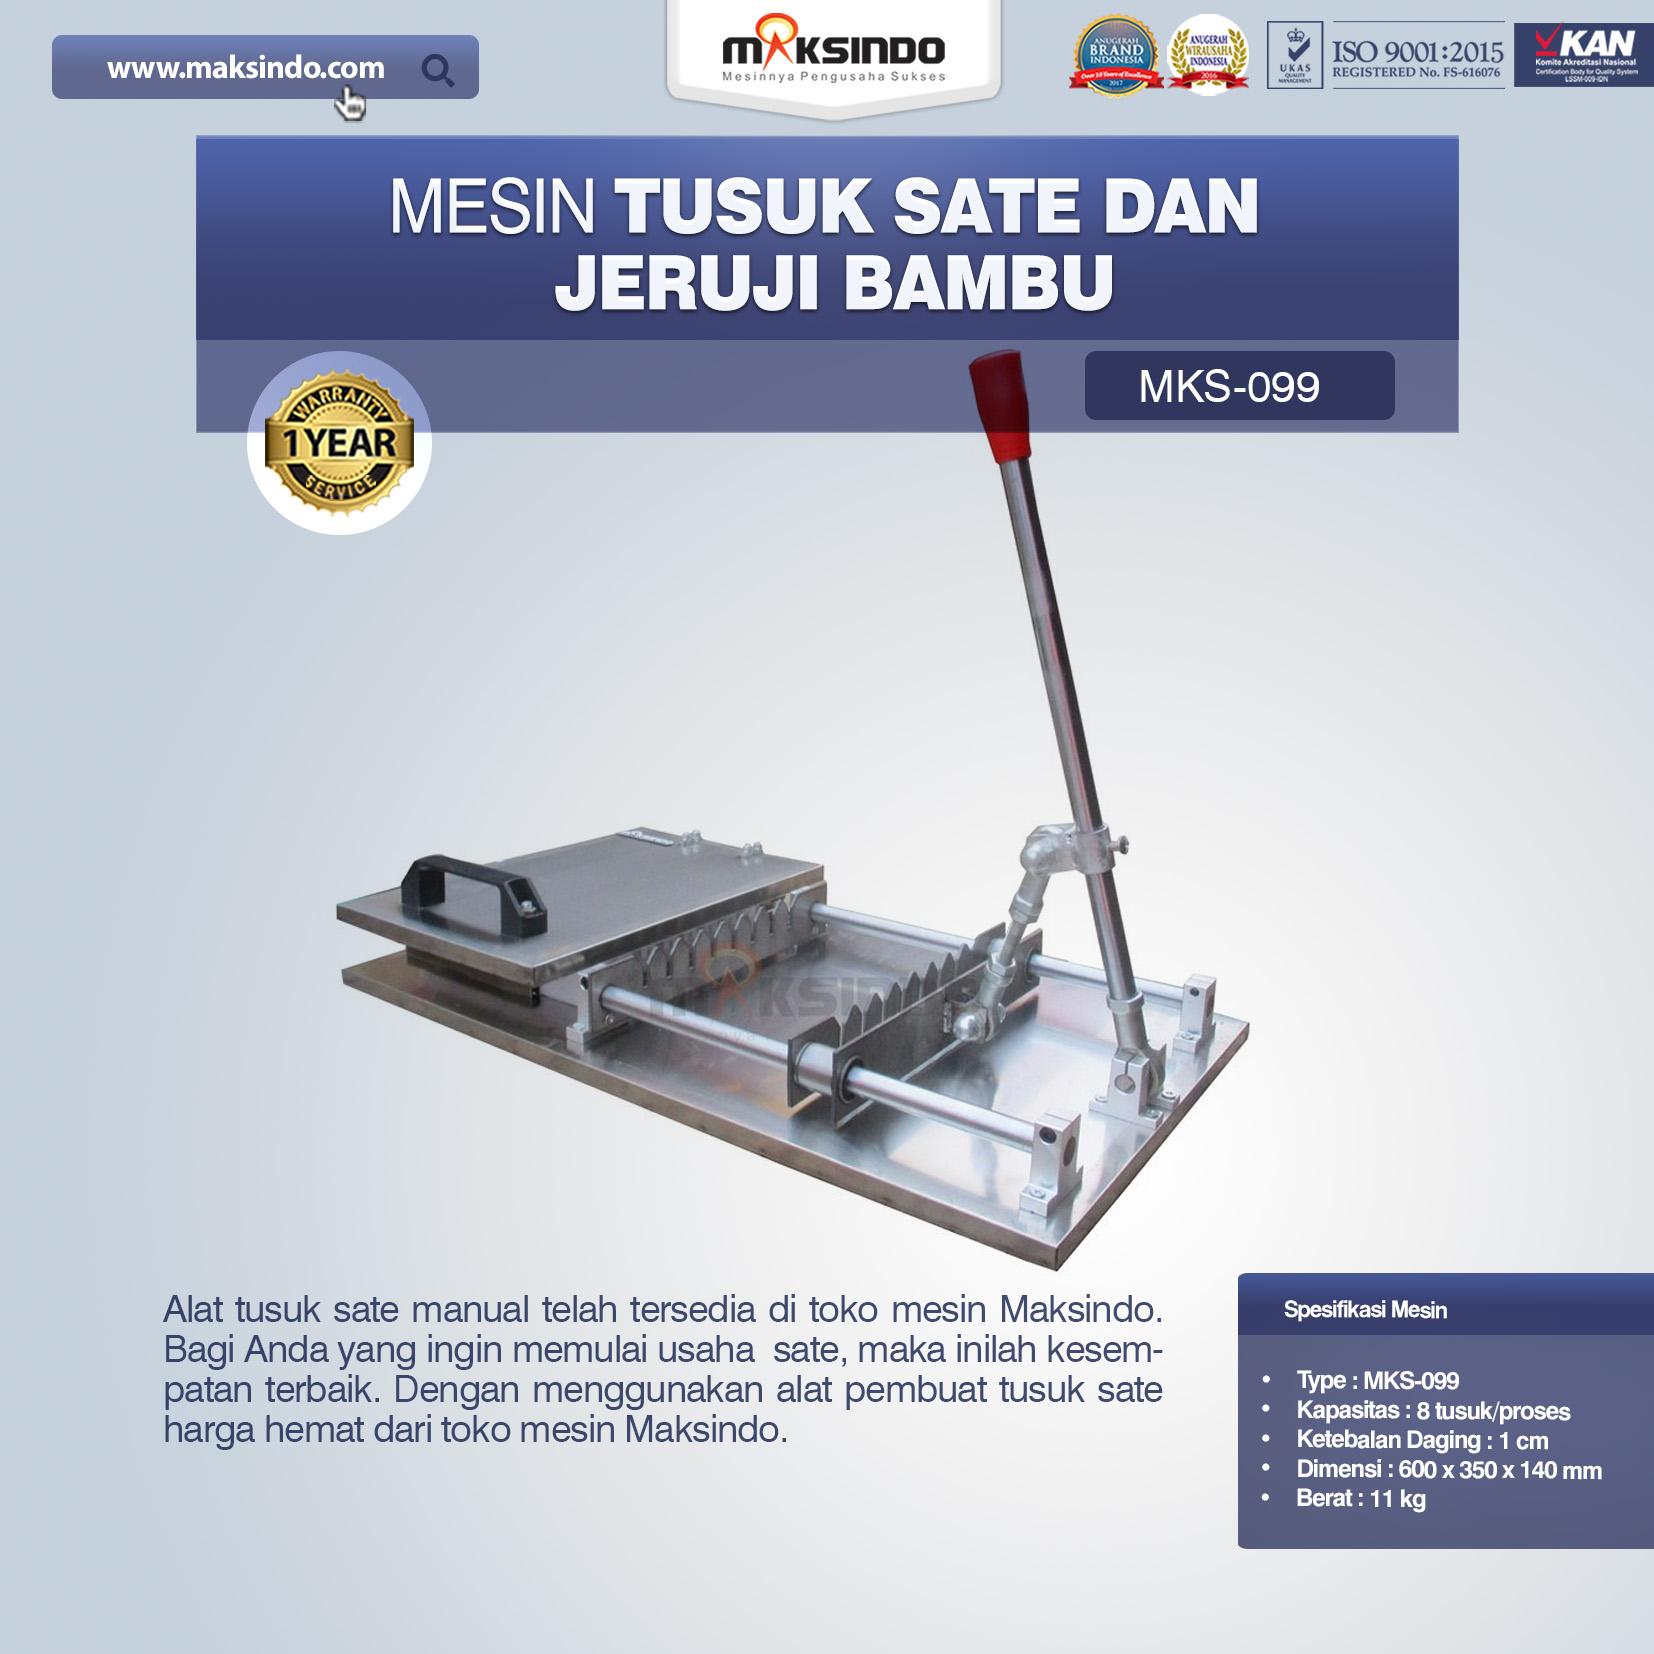 Jual Alat Tusuk Sate ManualMKS-099 di Jakarta